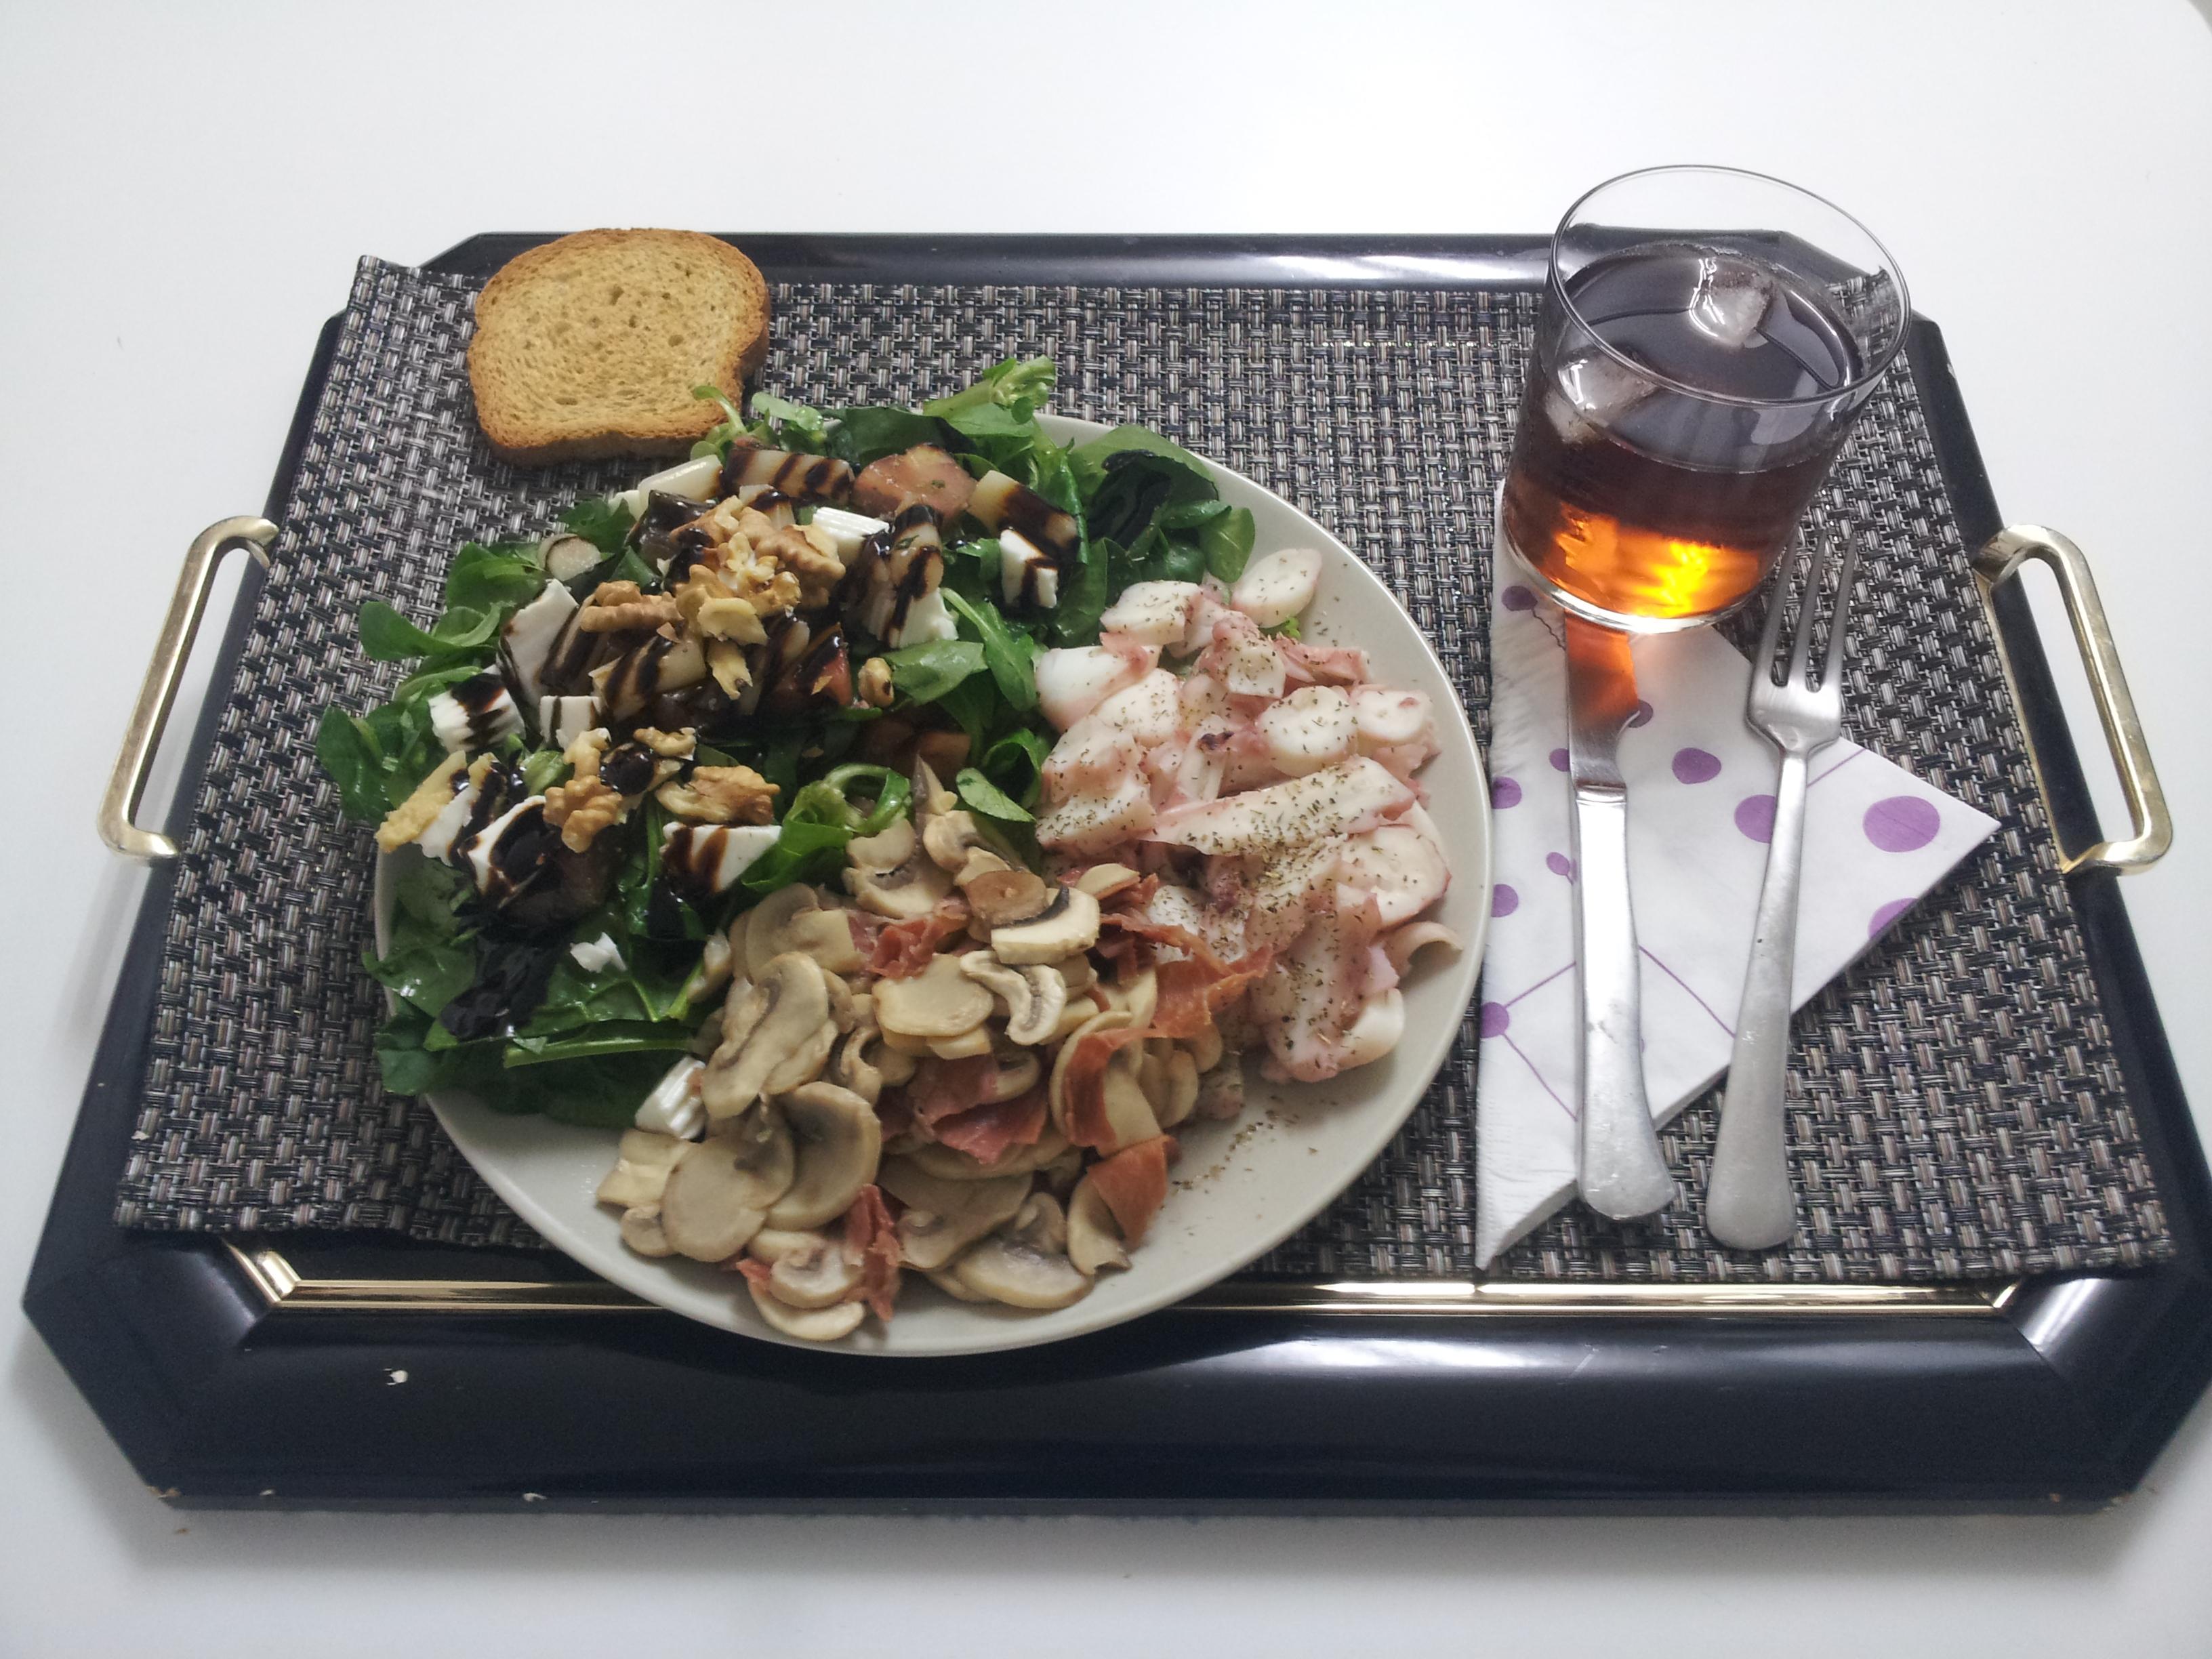 cenas saludables, recetas saludables, dieta sana.